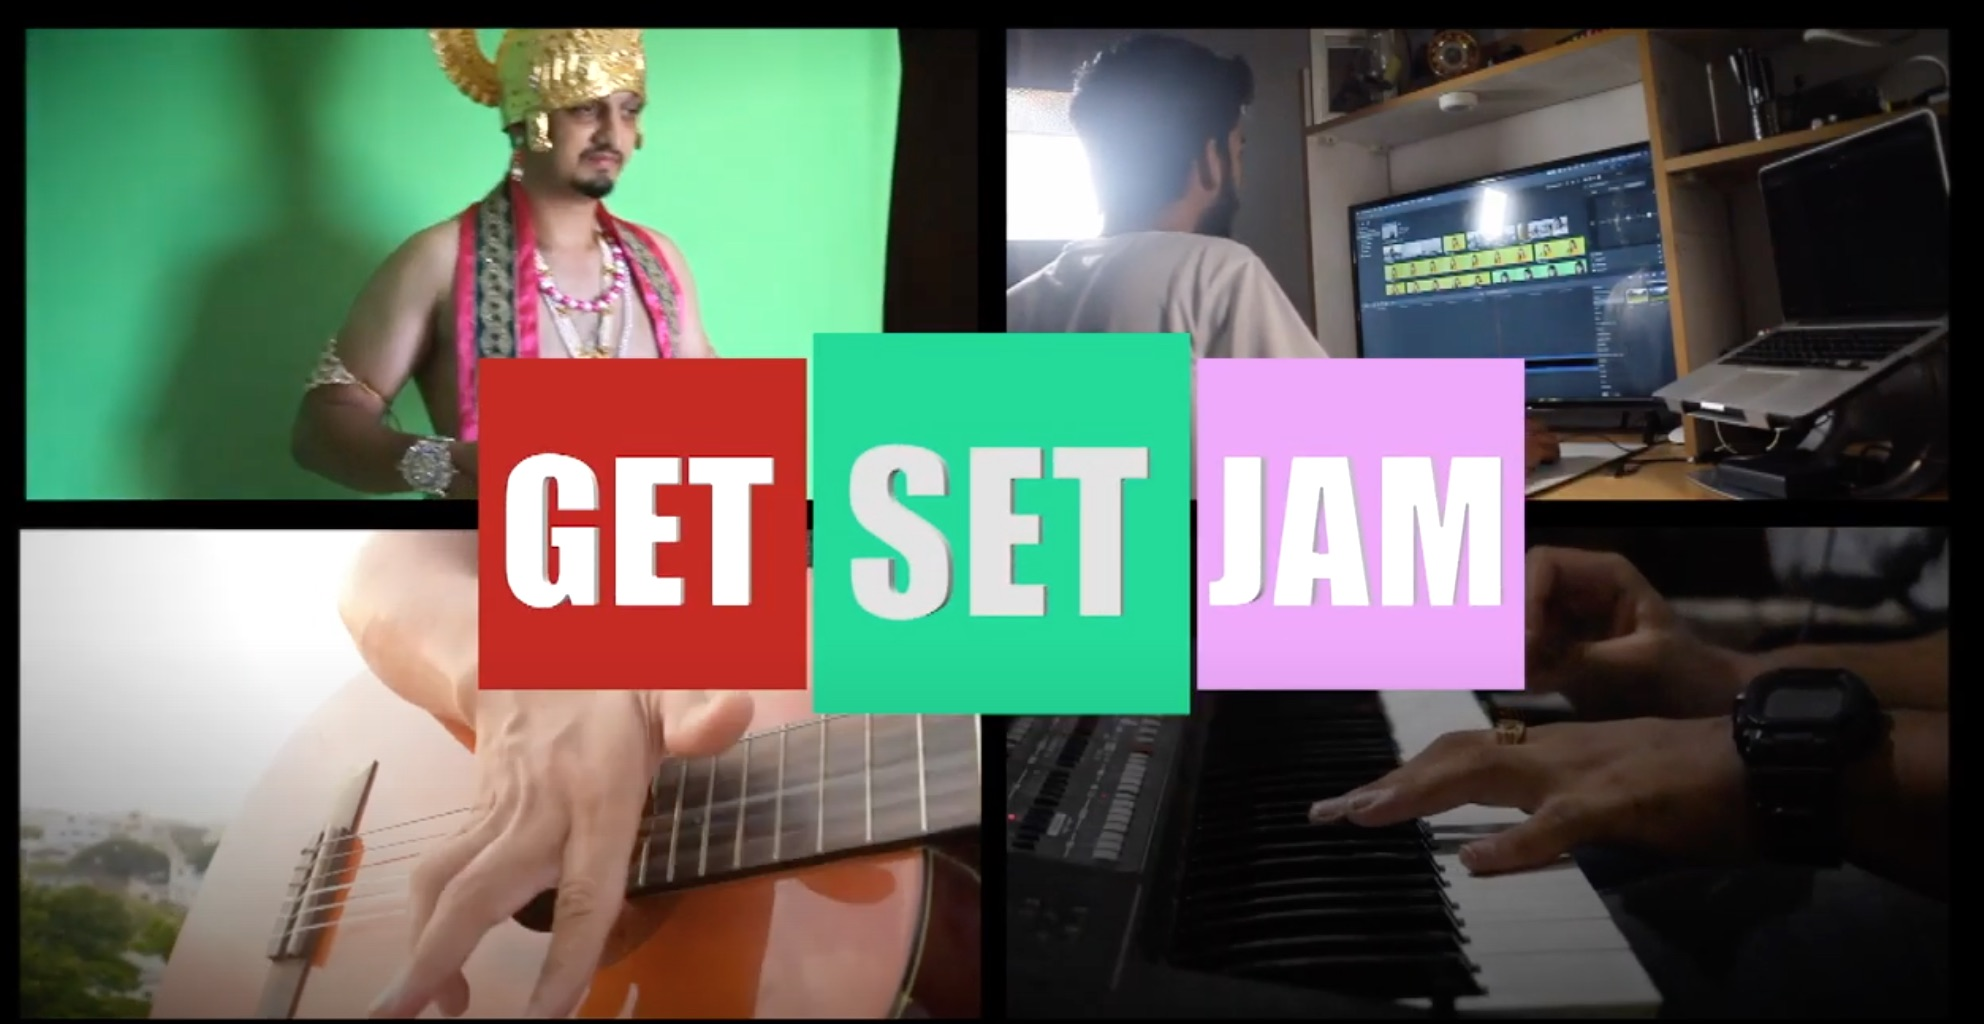 GET SET JAM - My Rode Reel 2020